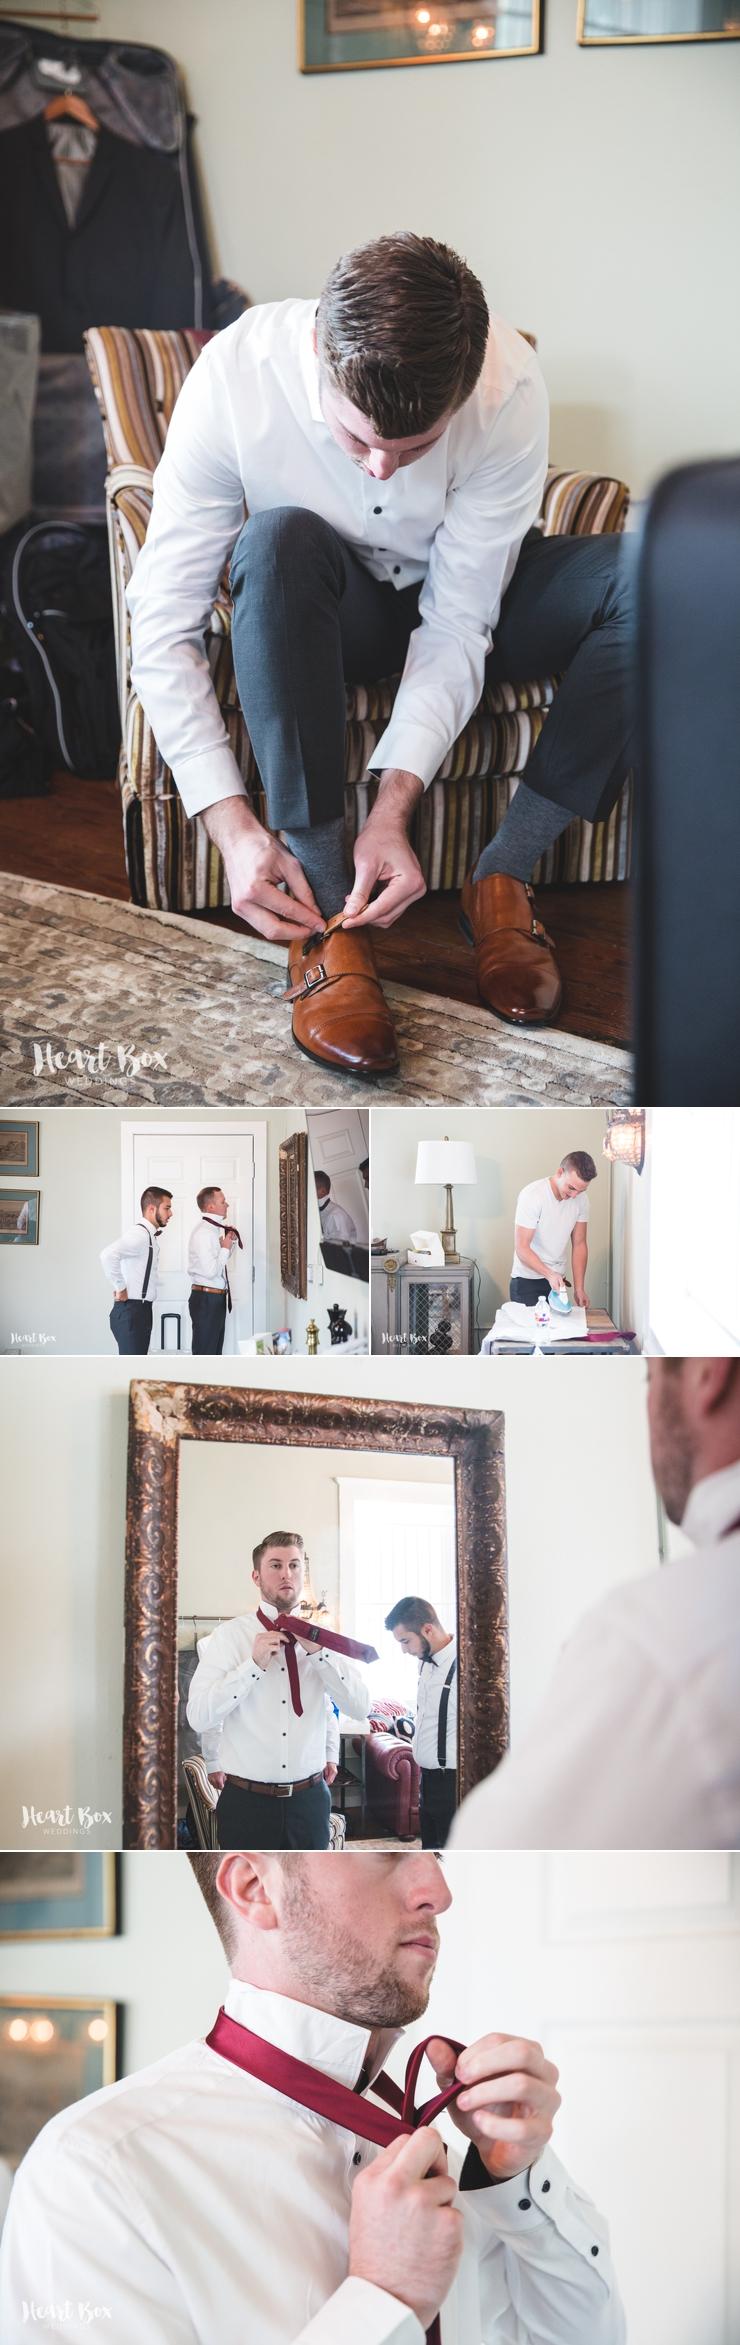 Hicks Wedding 6.jpg